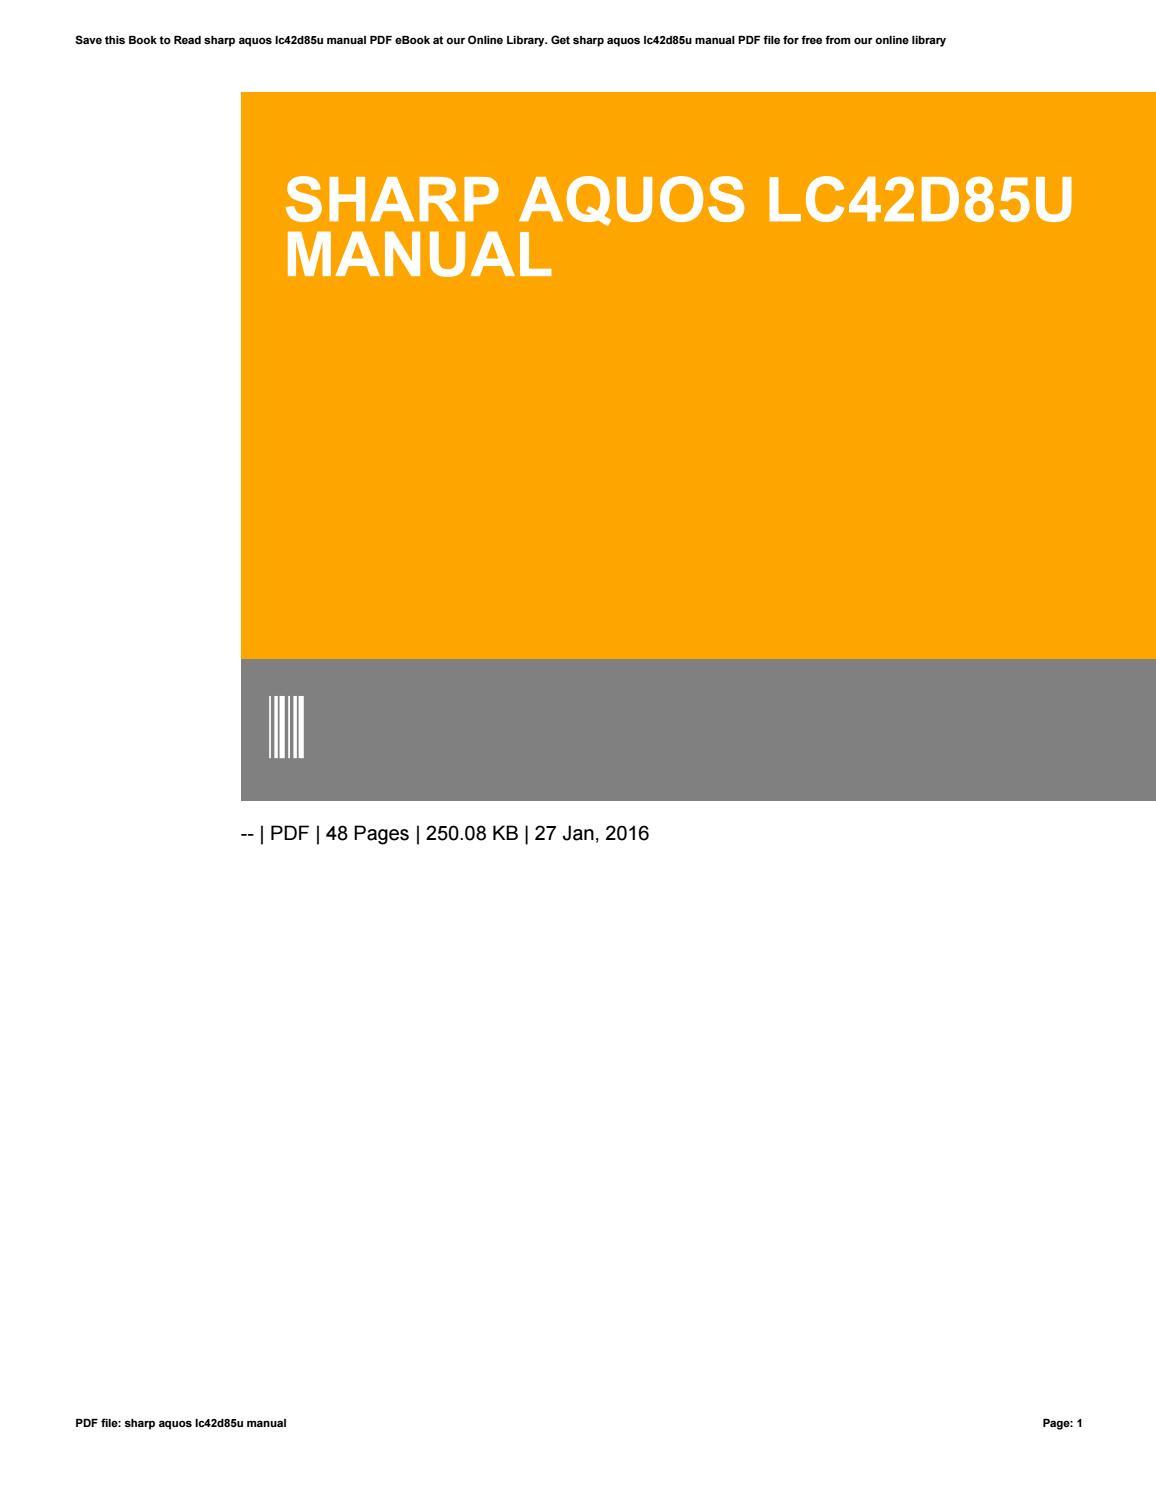 Sharp aquos lc42d85u manual by isdaq56 - issuu